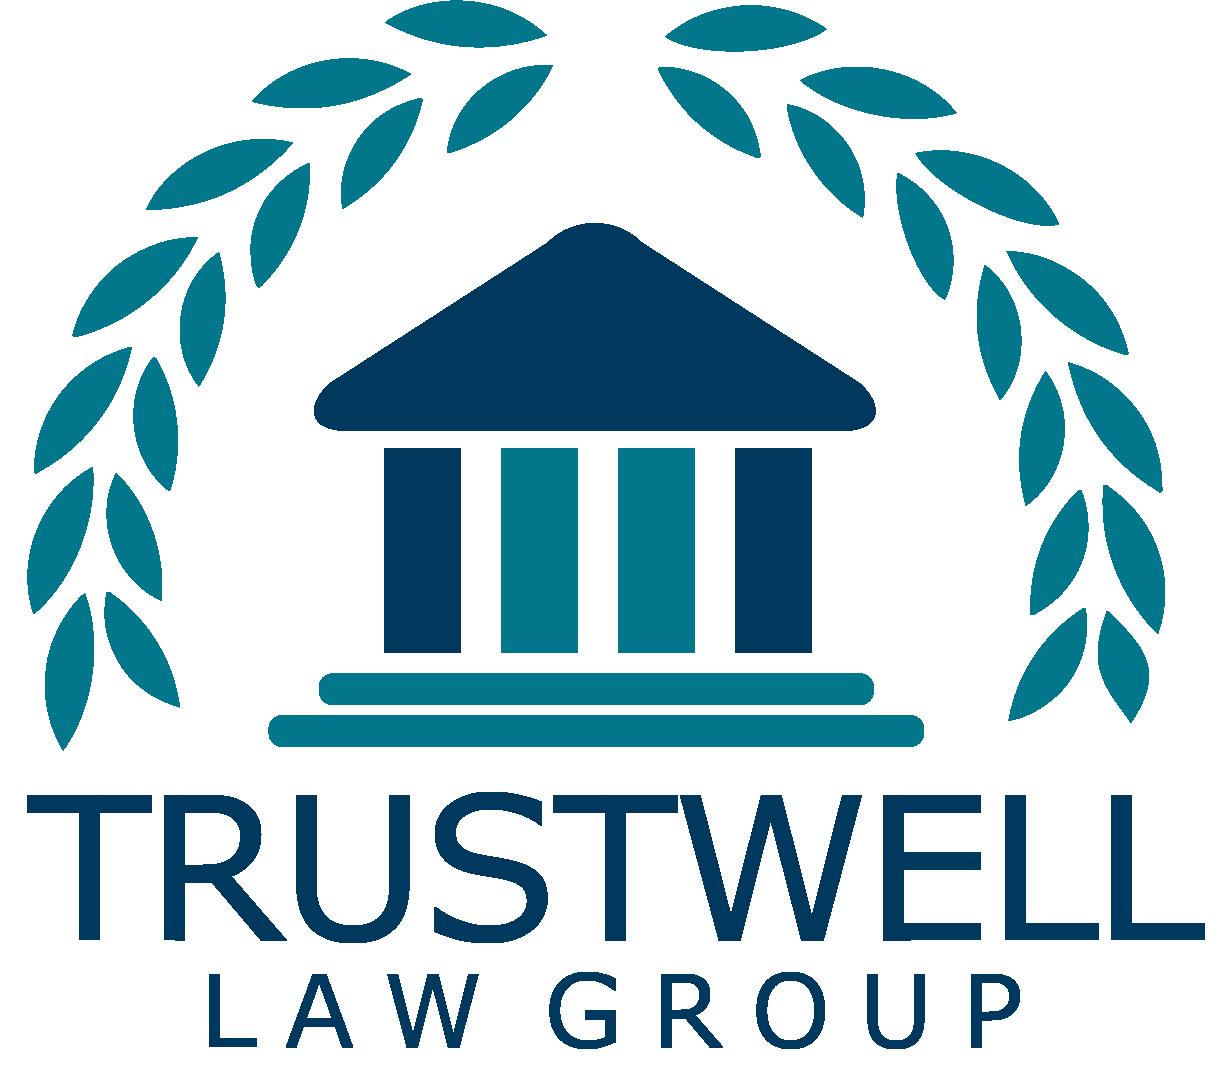 Trustwell Law Group LLP logo